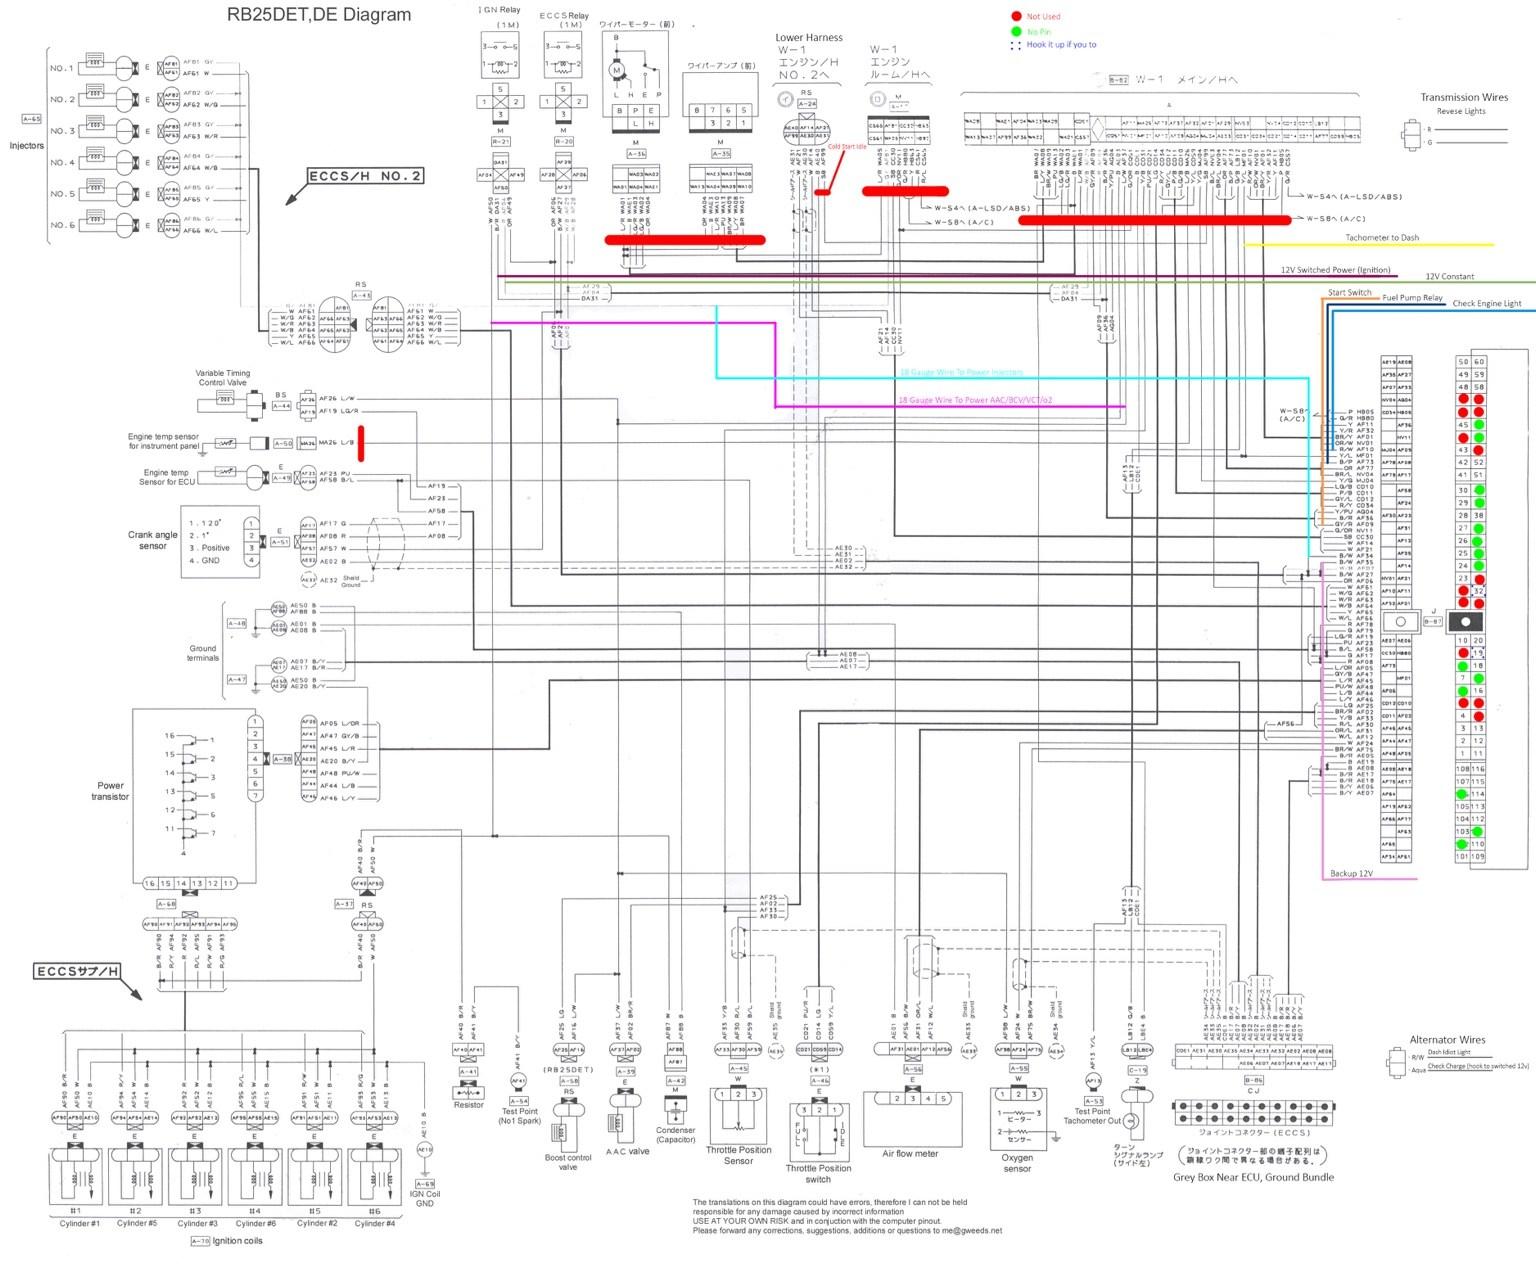 R34 Rb25det Wiring Diagram